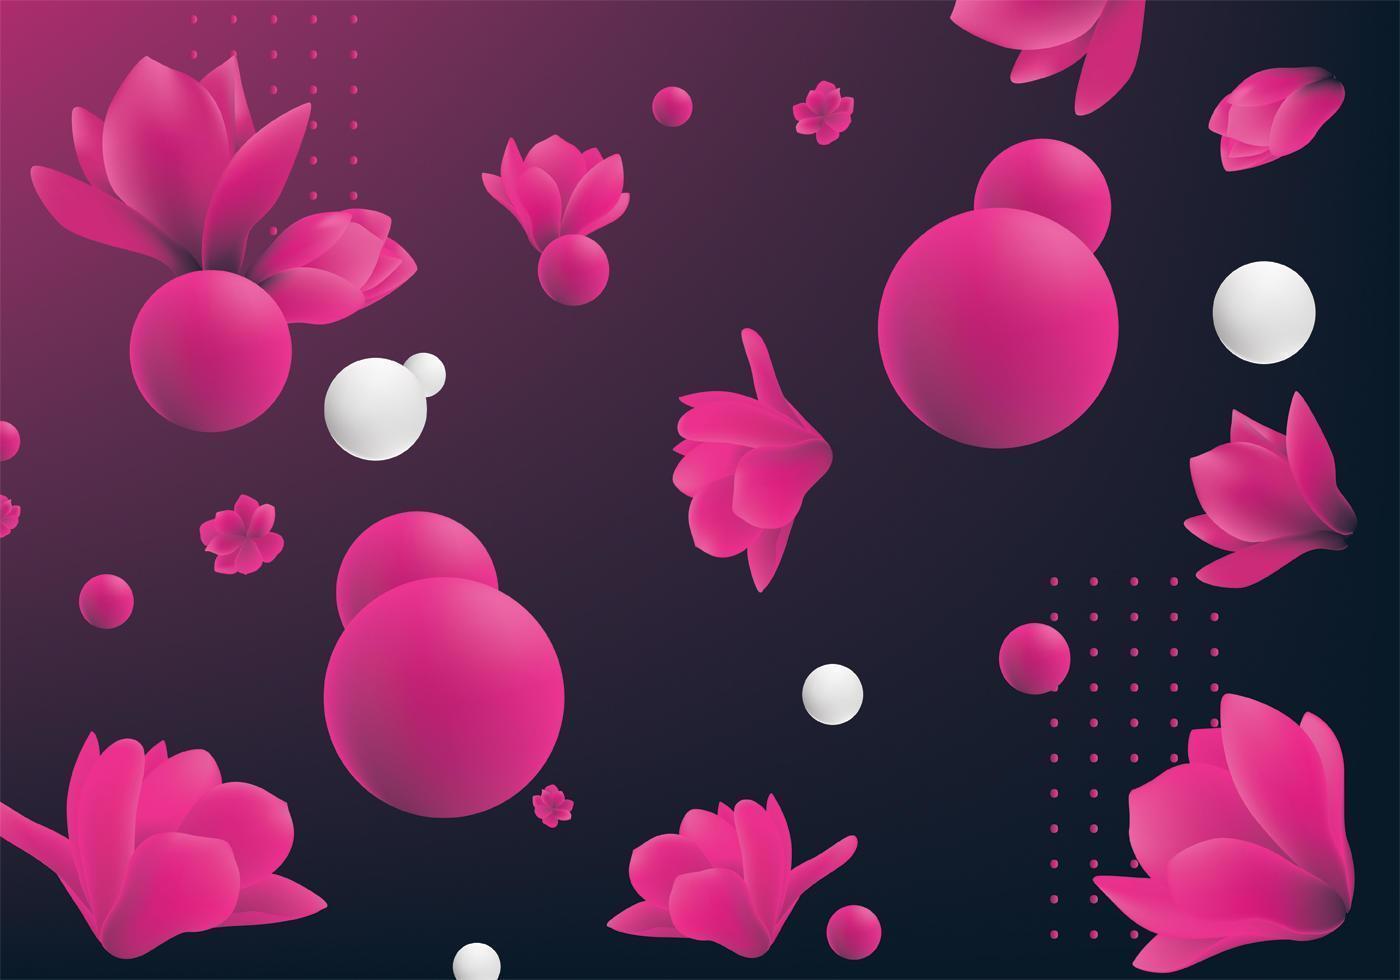 Projeto do vetor da flor 3d